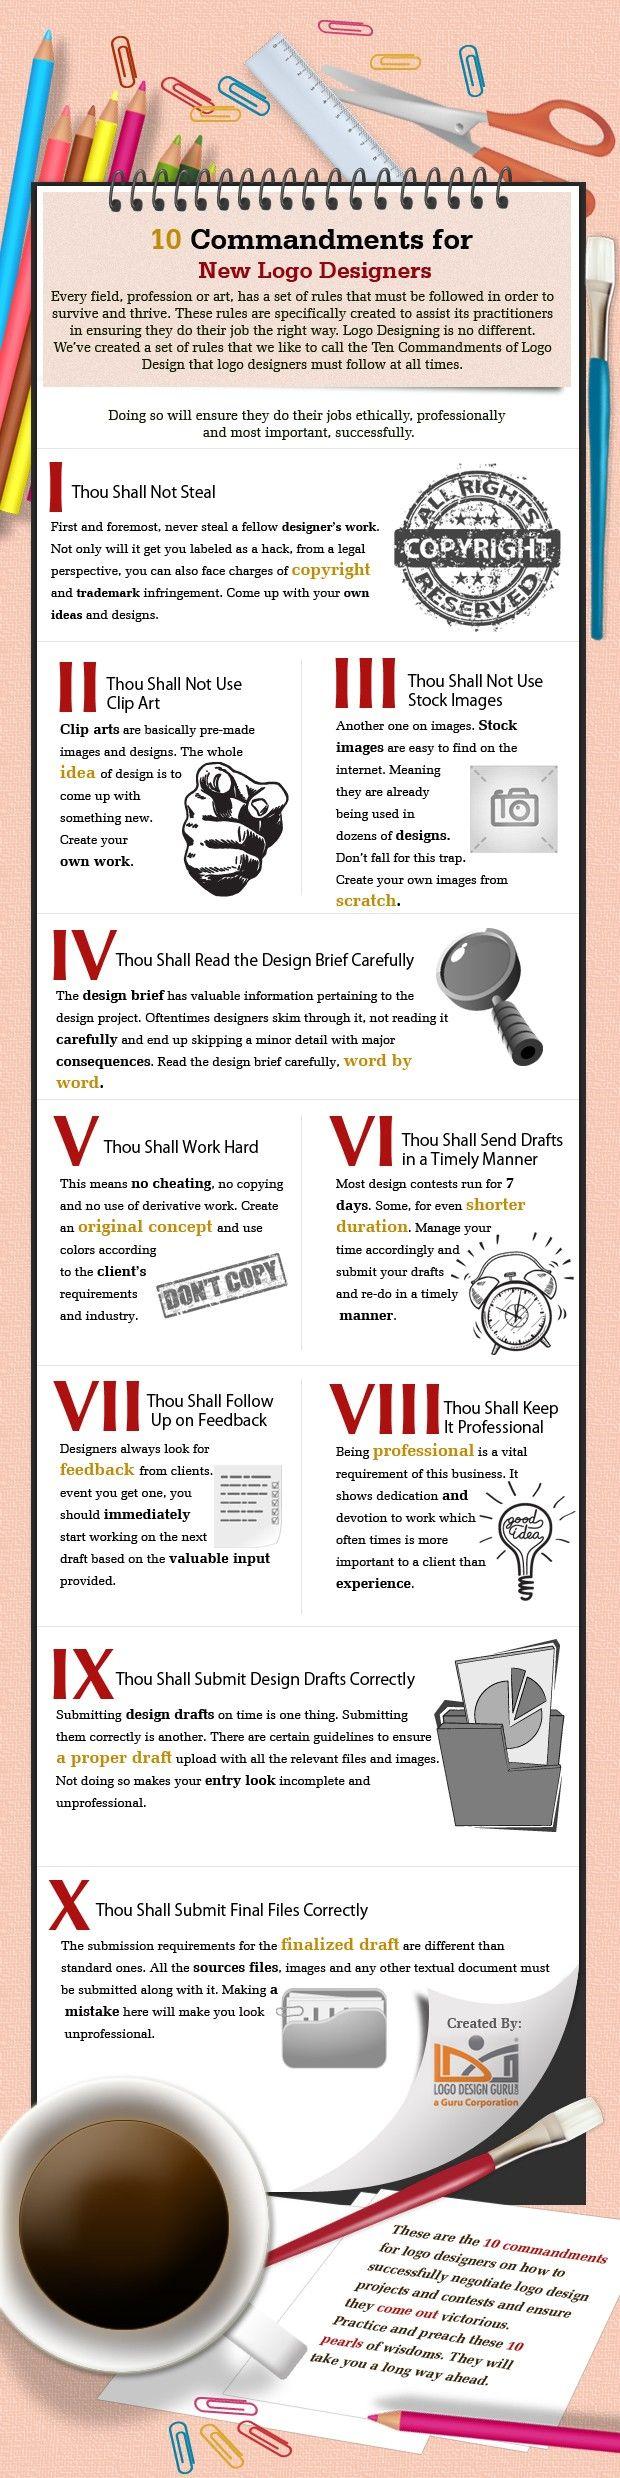 10 commandments for new #Logo designers - #Design